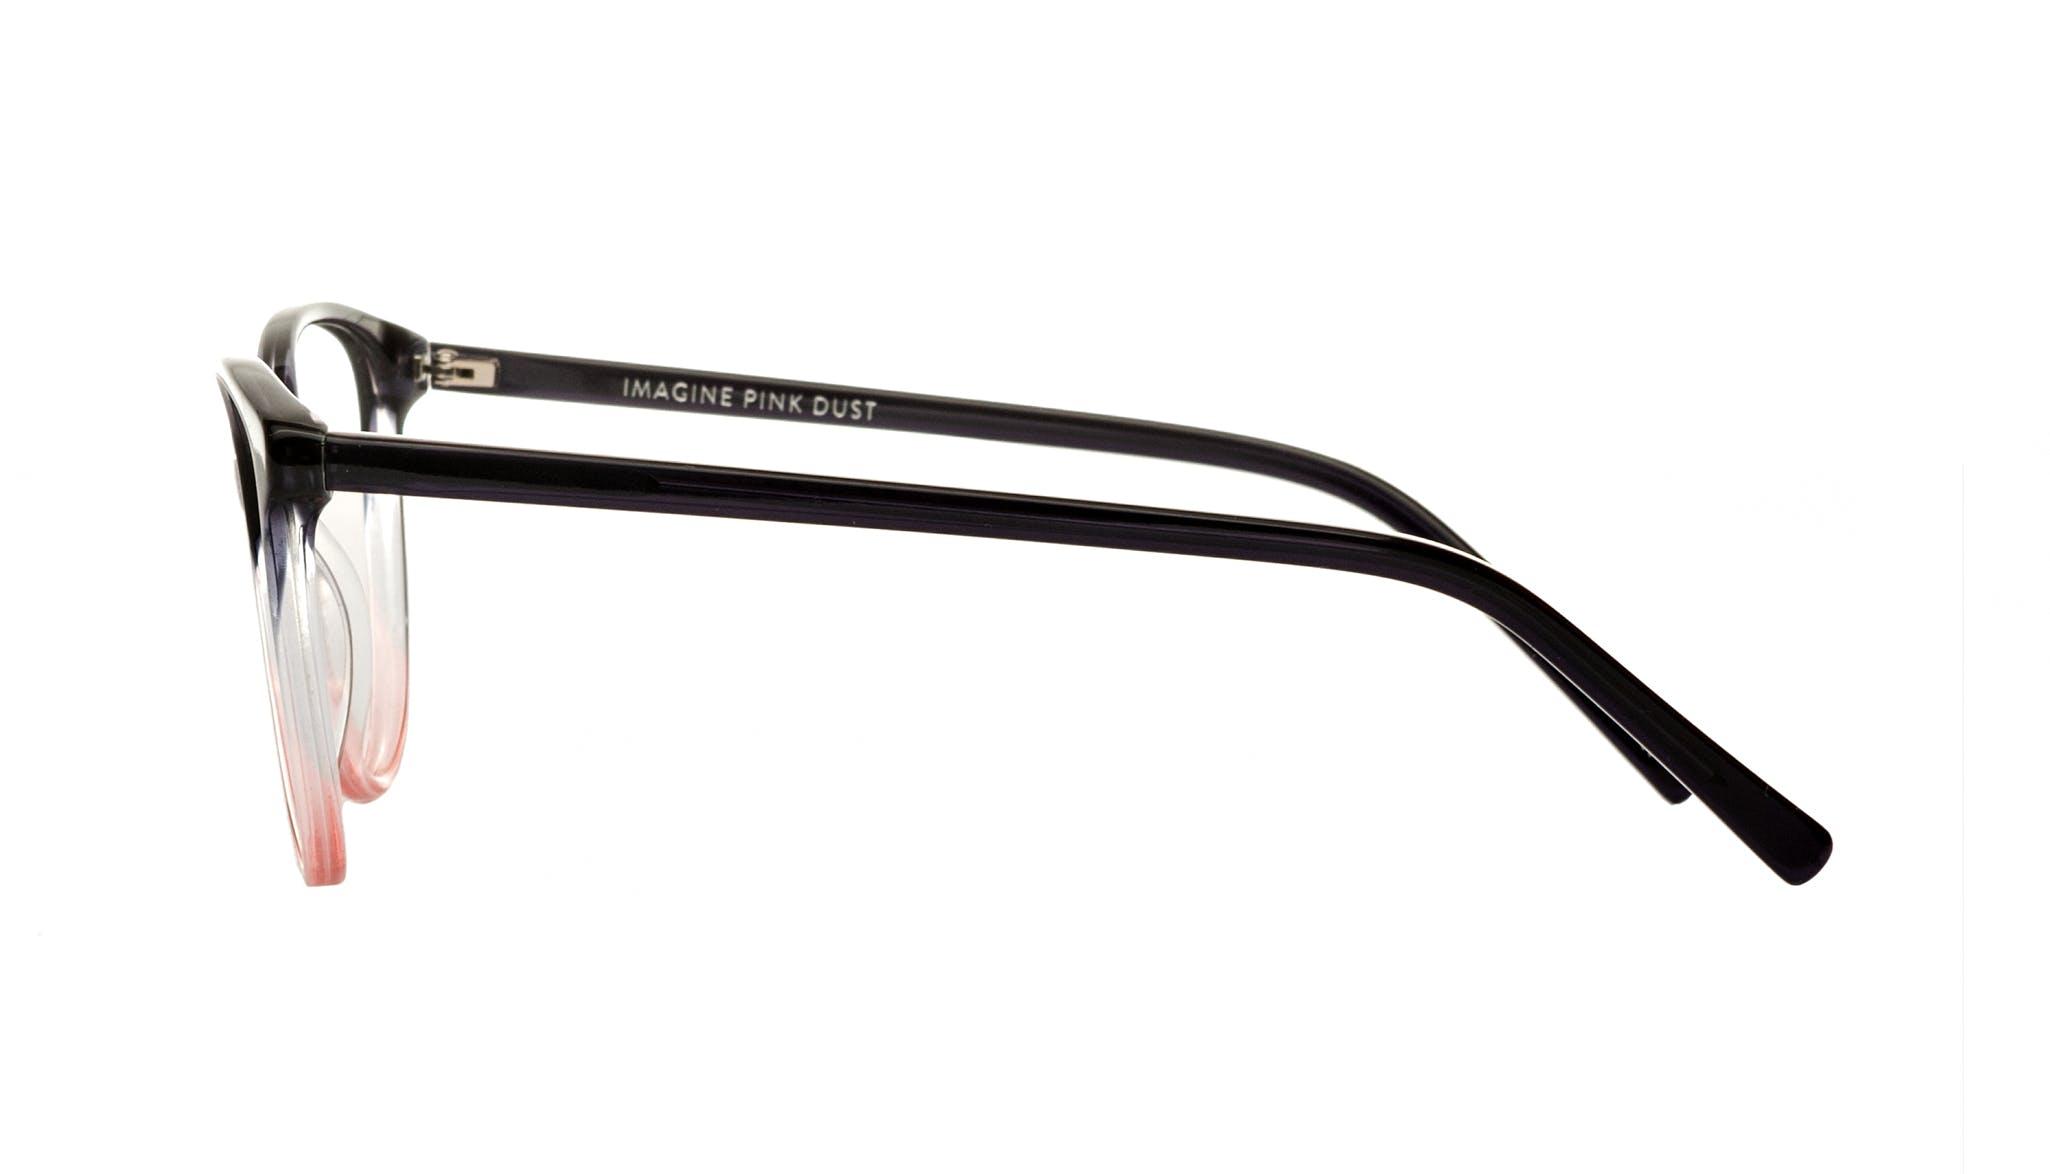 Affordable Fashion Glasses Round Eyeglasses Women Imagine Pink Dust Side